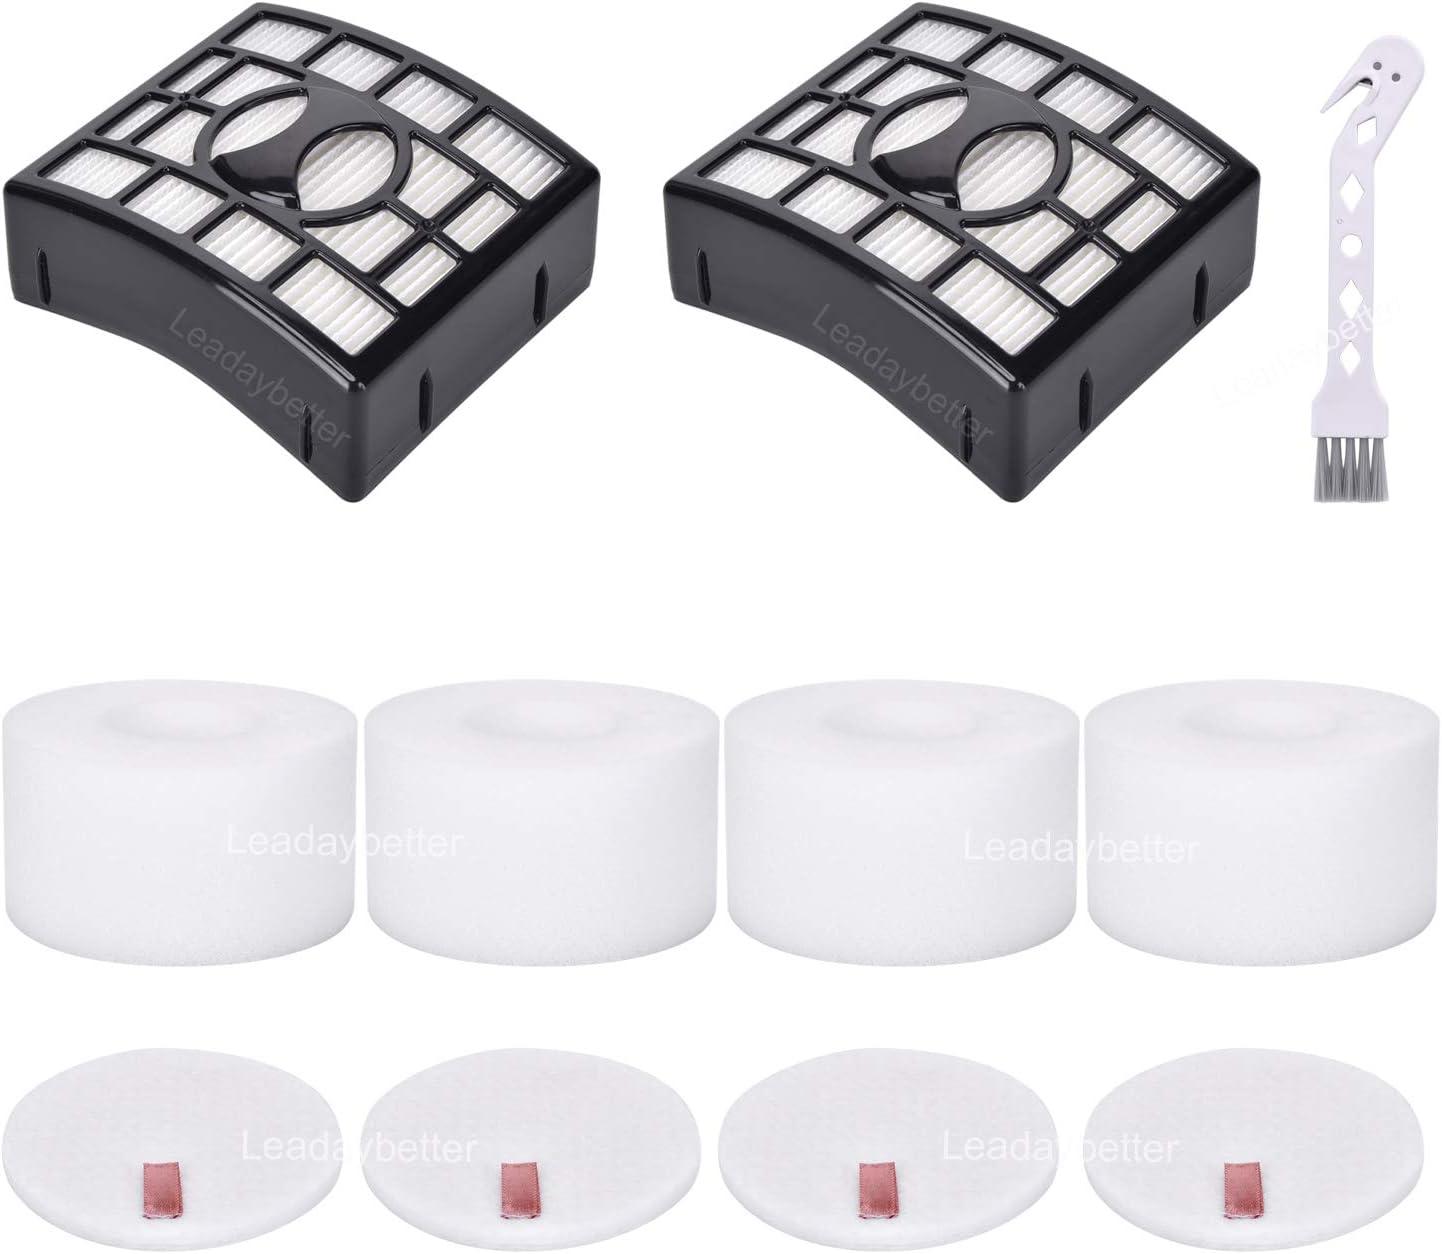 2+2 HEPA Foam Filter for Shark Rotator NV680 NV681 NV682 NV683 NV801 Vacuum